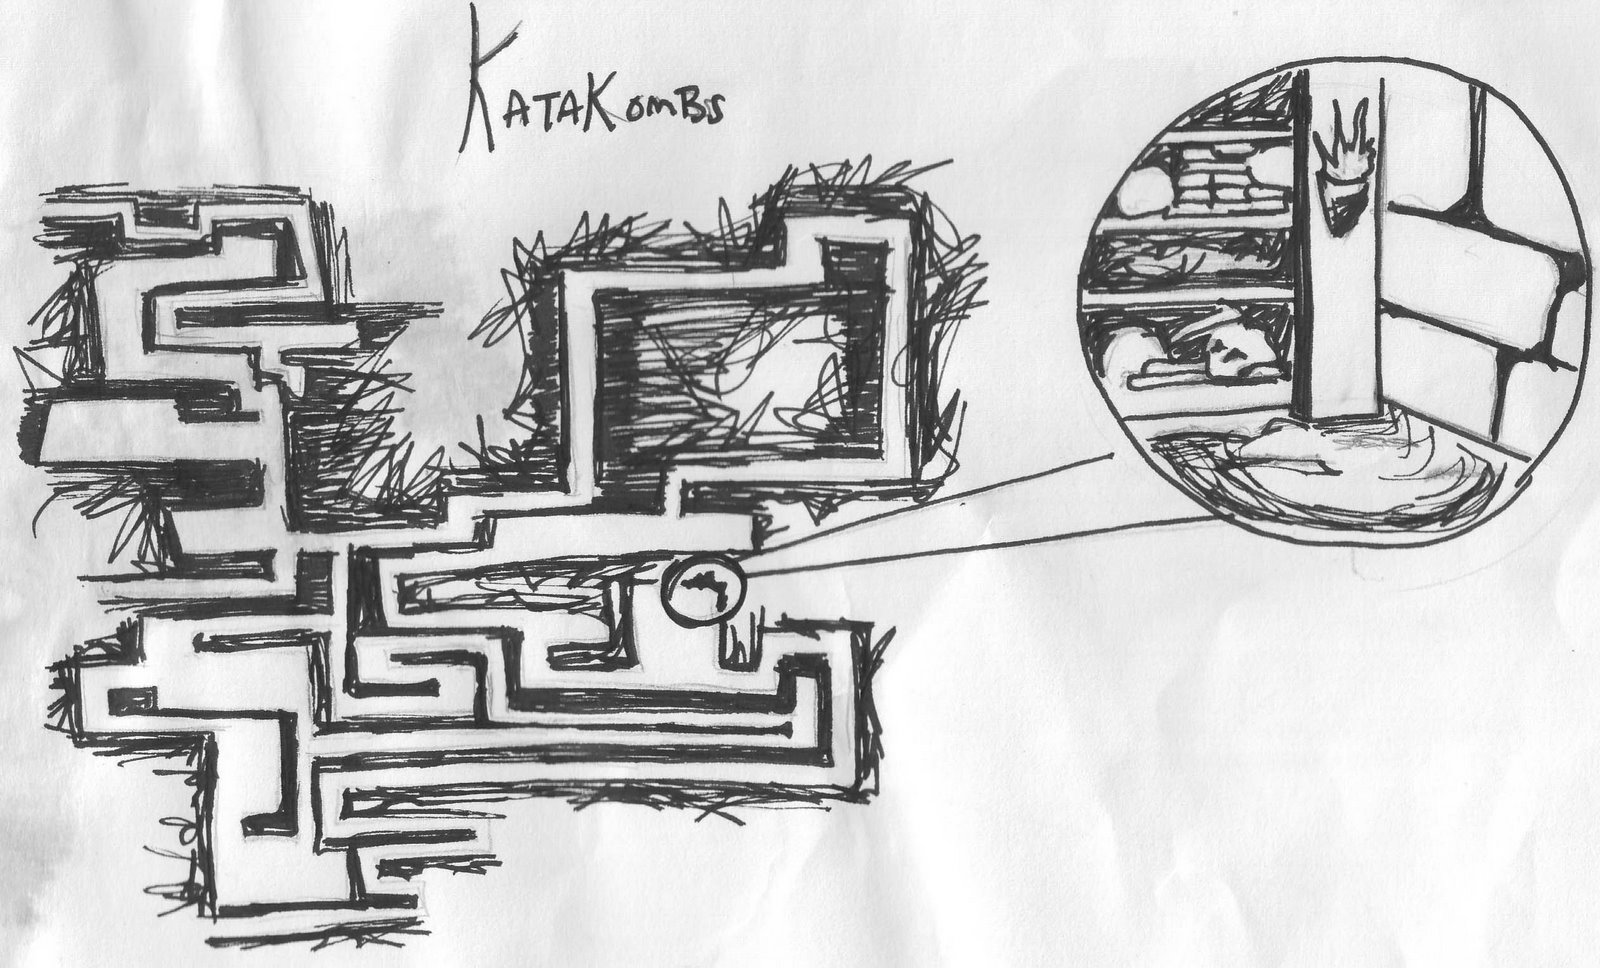 Katakombz map.jpg